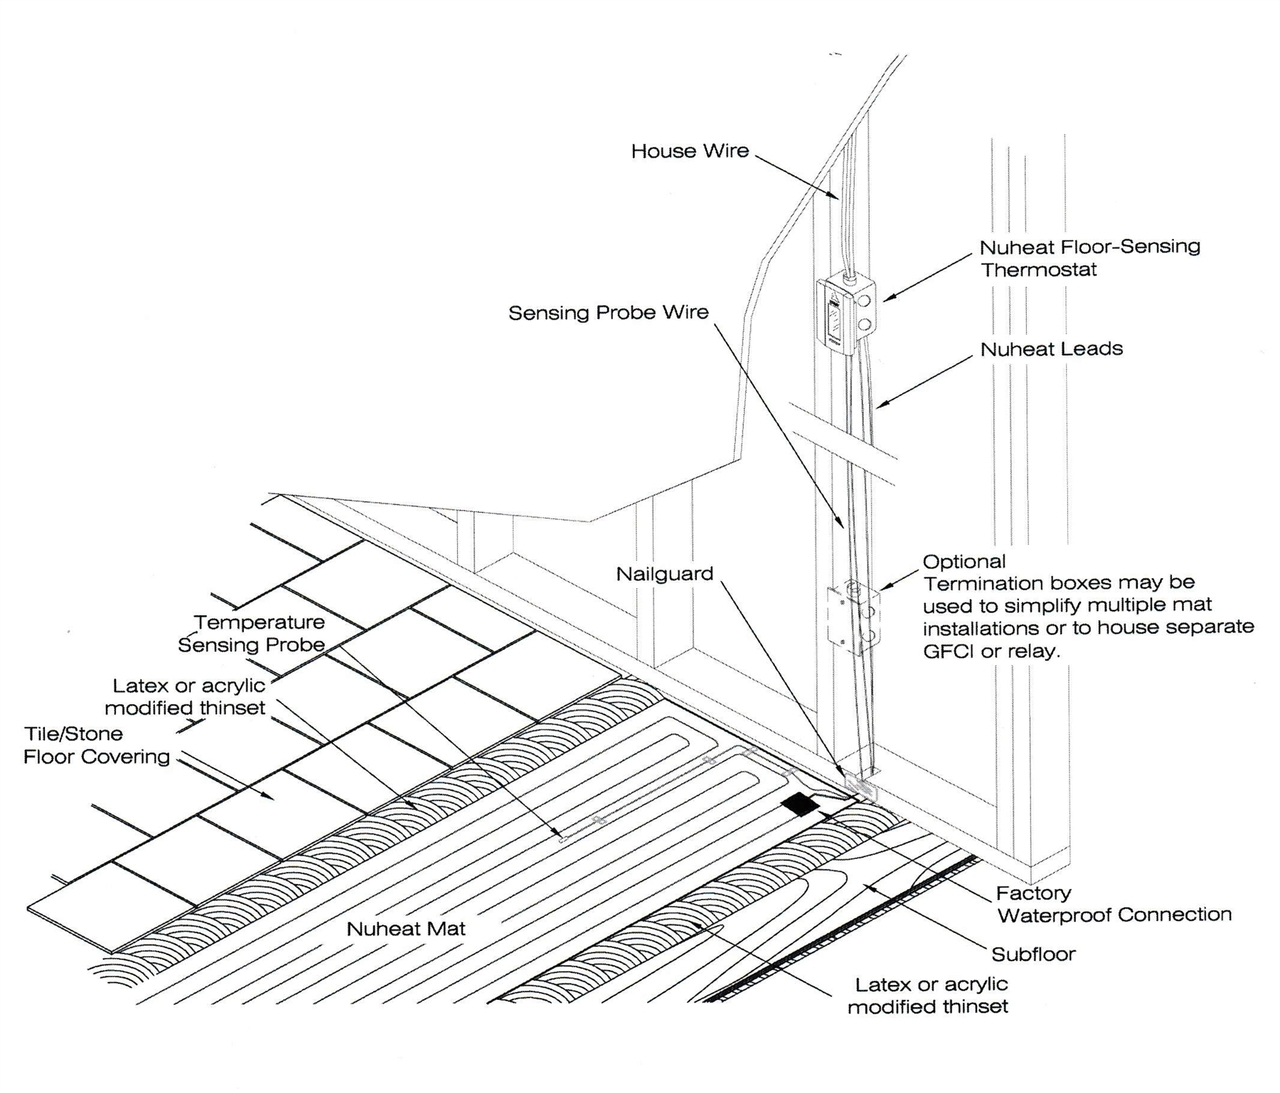 Nuheat Electric Floor Heating Mat - 9 Ft. Series / 240 Volt on broan wiring diagram, trane wiring diagram, rheem wiring diagram, suntouch wiring diagram, intermatic wiring diagram, jacuzzi wiring diagram, lightolier wiring diagram, warmly yours wiring diagram, square d wiring diagram, whirlpool wiring diagram, panasonic wiring diagram, danfoss wiring diagram, emerson wiring diagram, honeywell wiring diagram, lutron wiring diagram, delta wiring diagram, frigidaire wiring diagram, easy heat wiring diagram, wac lighting wiring diagram, samsung wiring diagram,